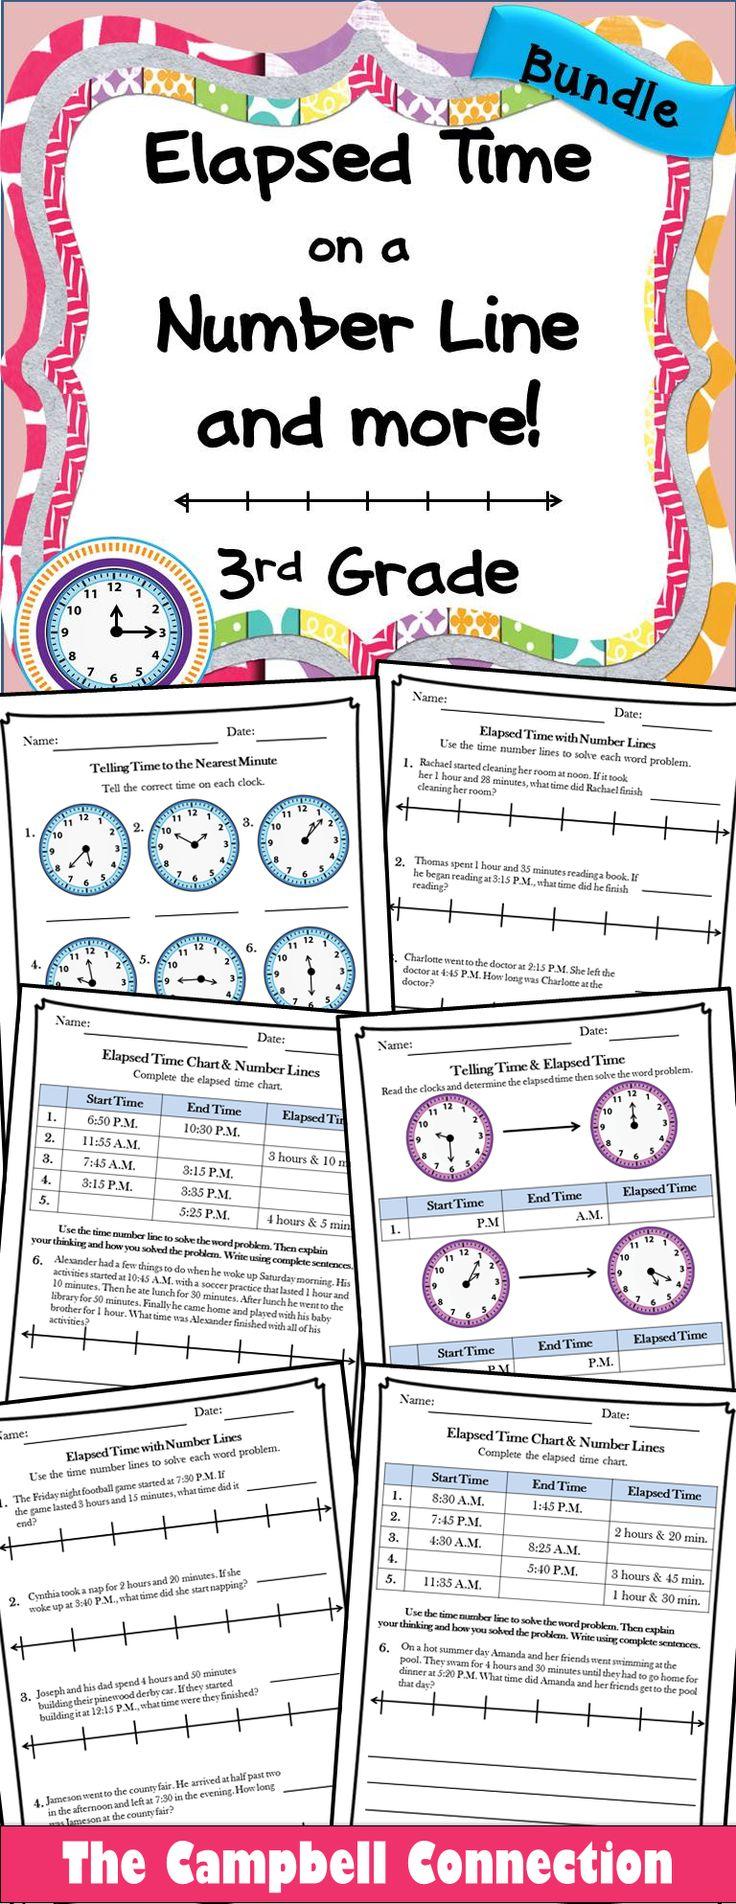 100 best images about math on pinterest math 1st grade math and multiplication worksheets. Black Bedroom Furniture Sets. Home Design Ideas